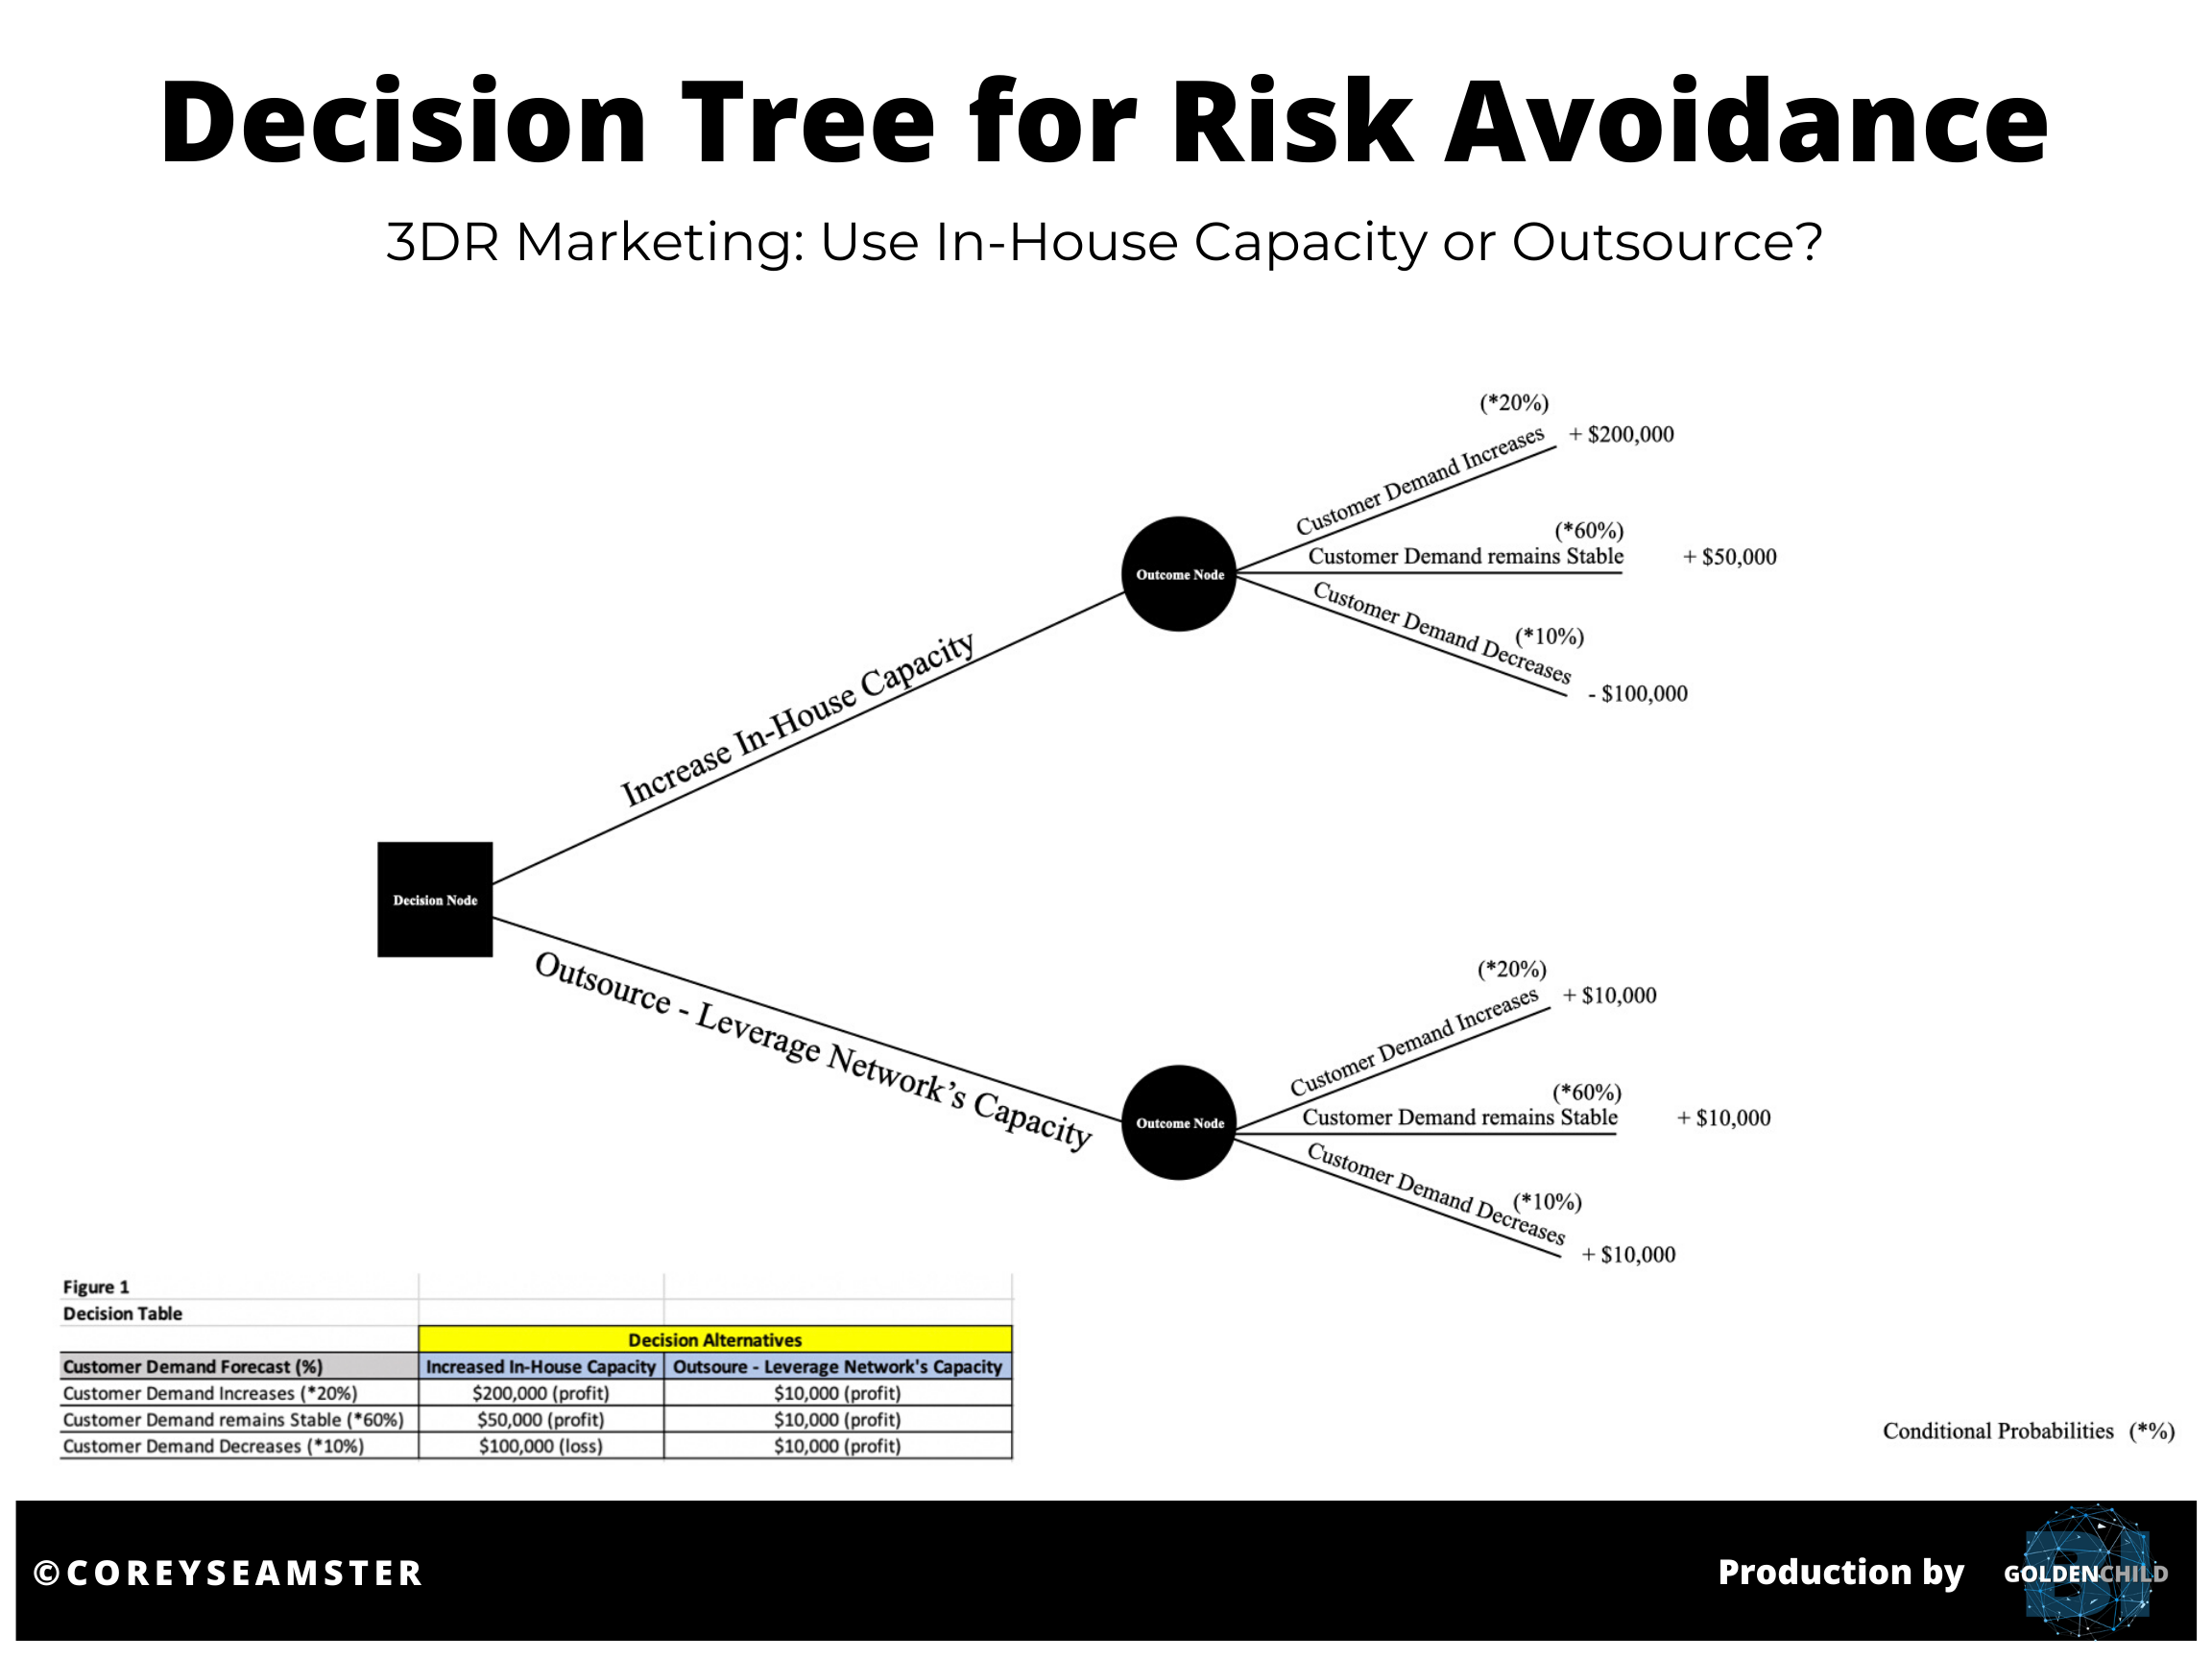 Source: Corey Seamster (2020) | Image: Decision Tree for 3DR Marketing Position (Hypothetical Scenario)